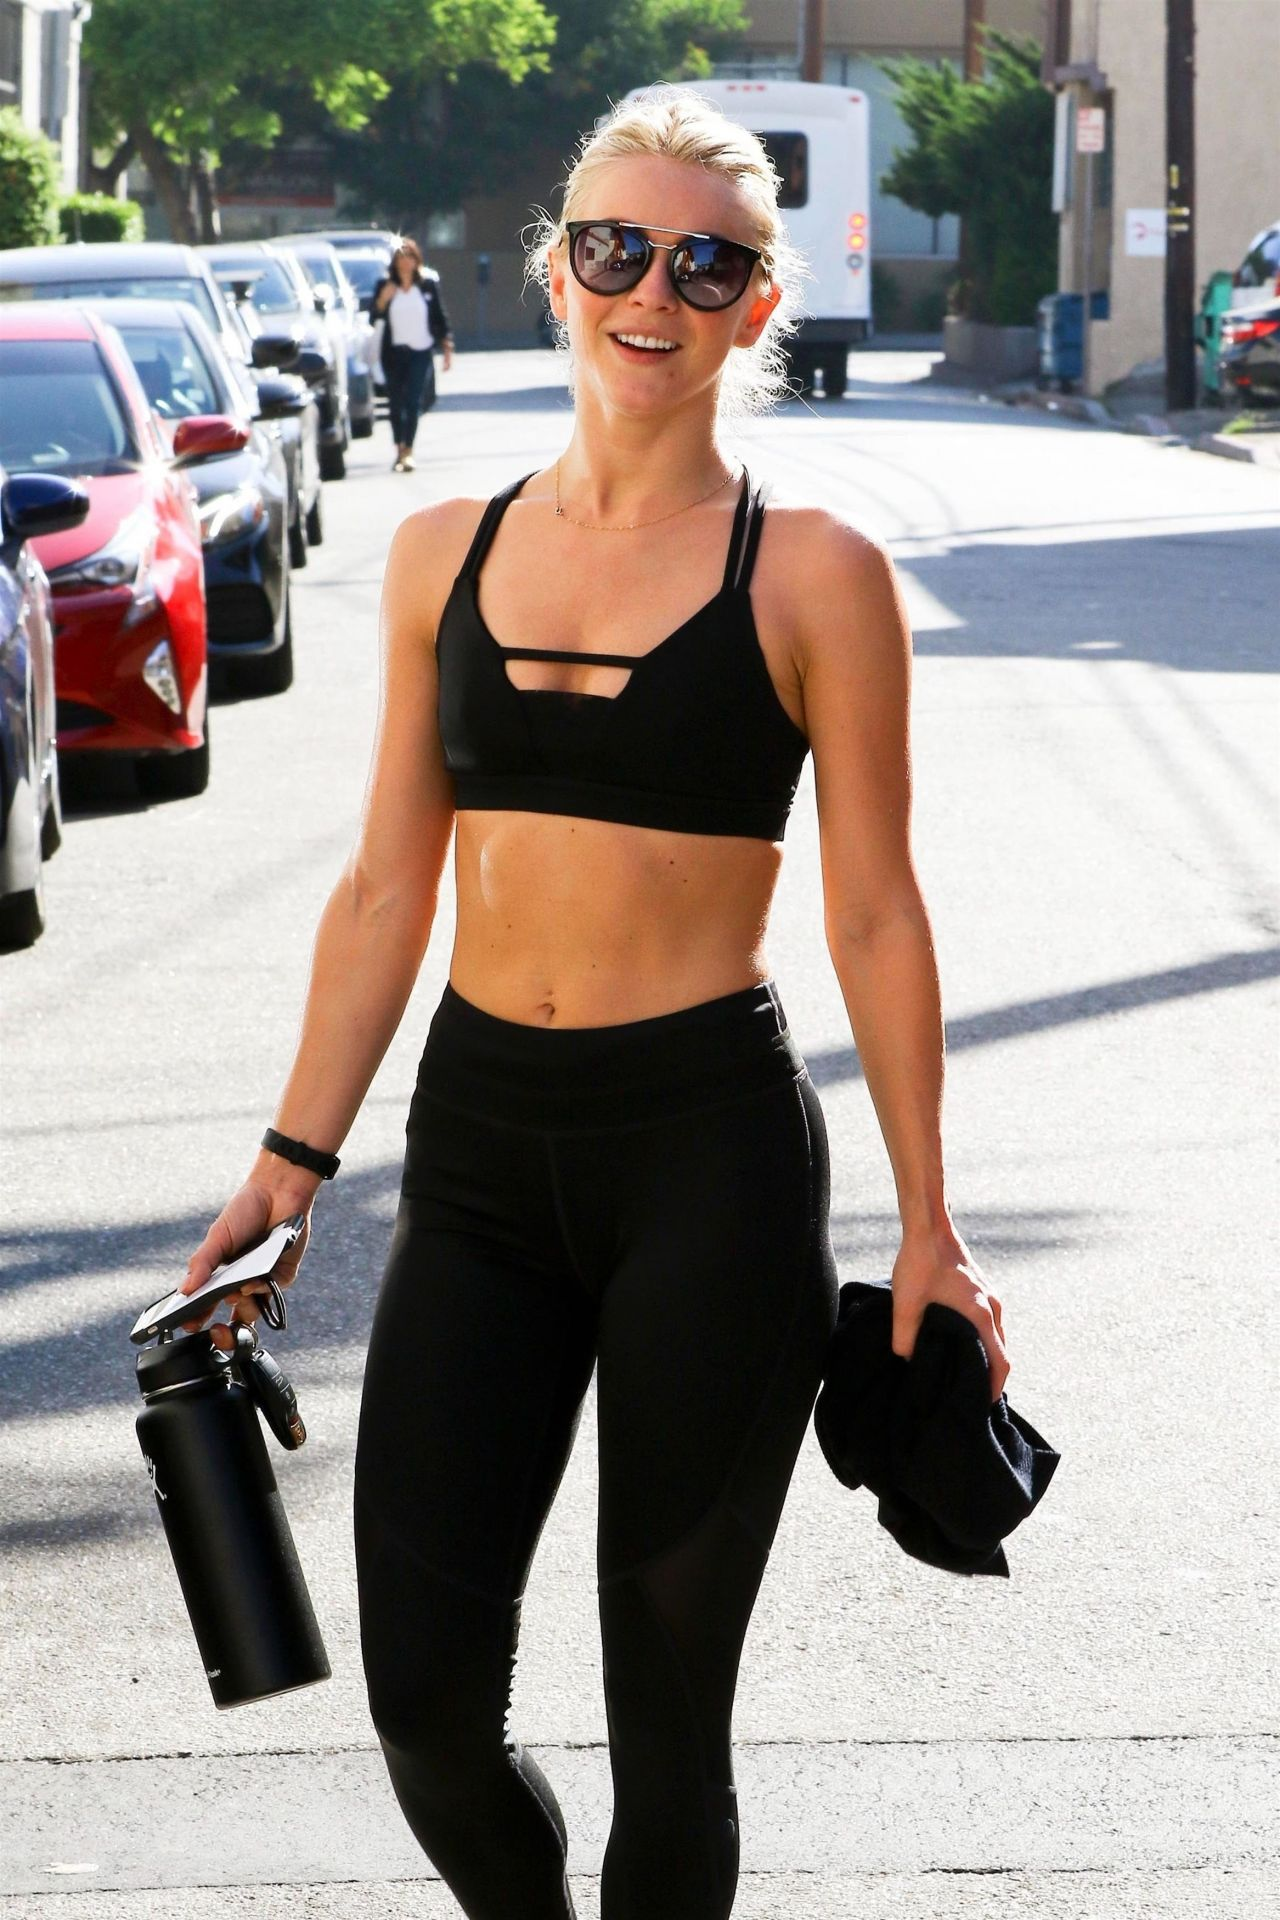 Julianne hough in workout gear studio city naked (64 photo), Sideboobs Celebrites image